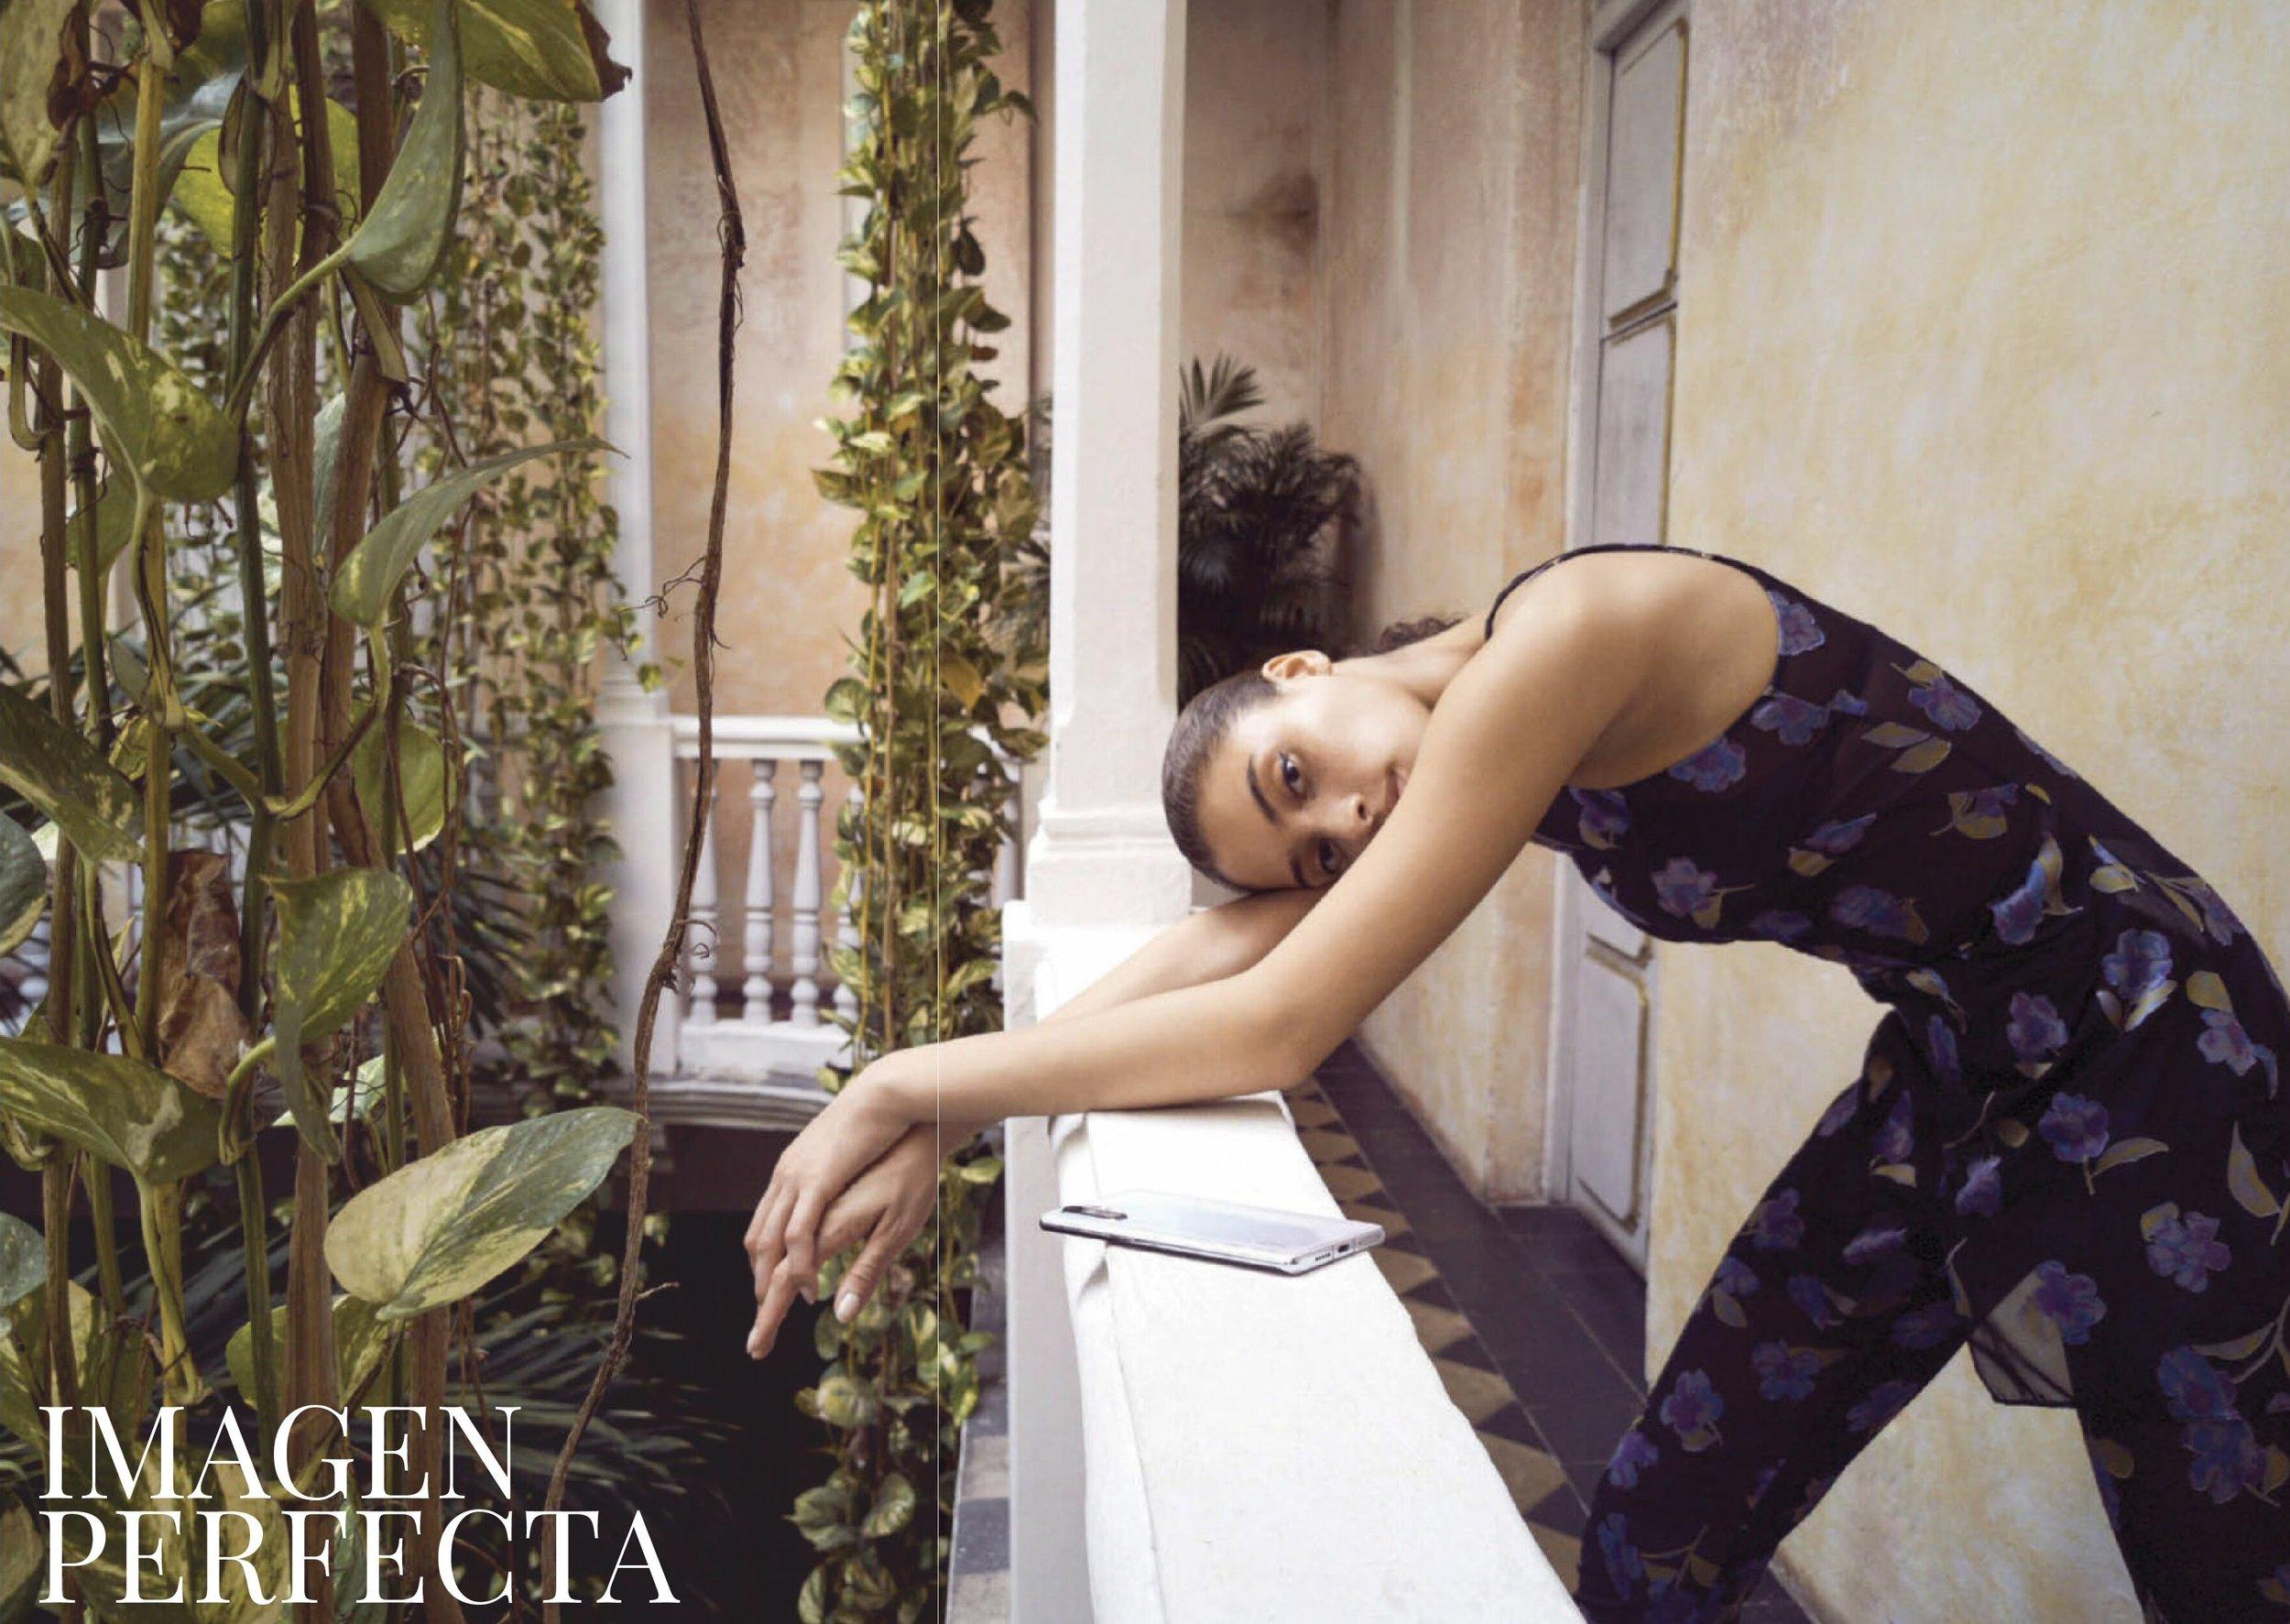 Khadija-Red-Thunder-Bjorn-Iooss-Vogue-Latin-America-May-2019- (3).jpg